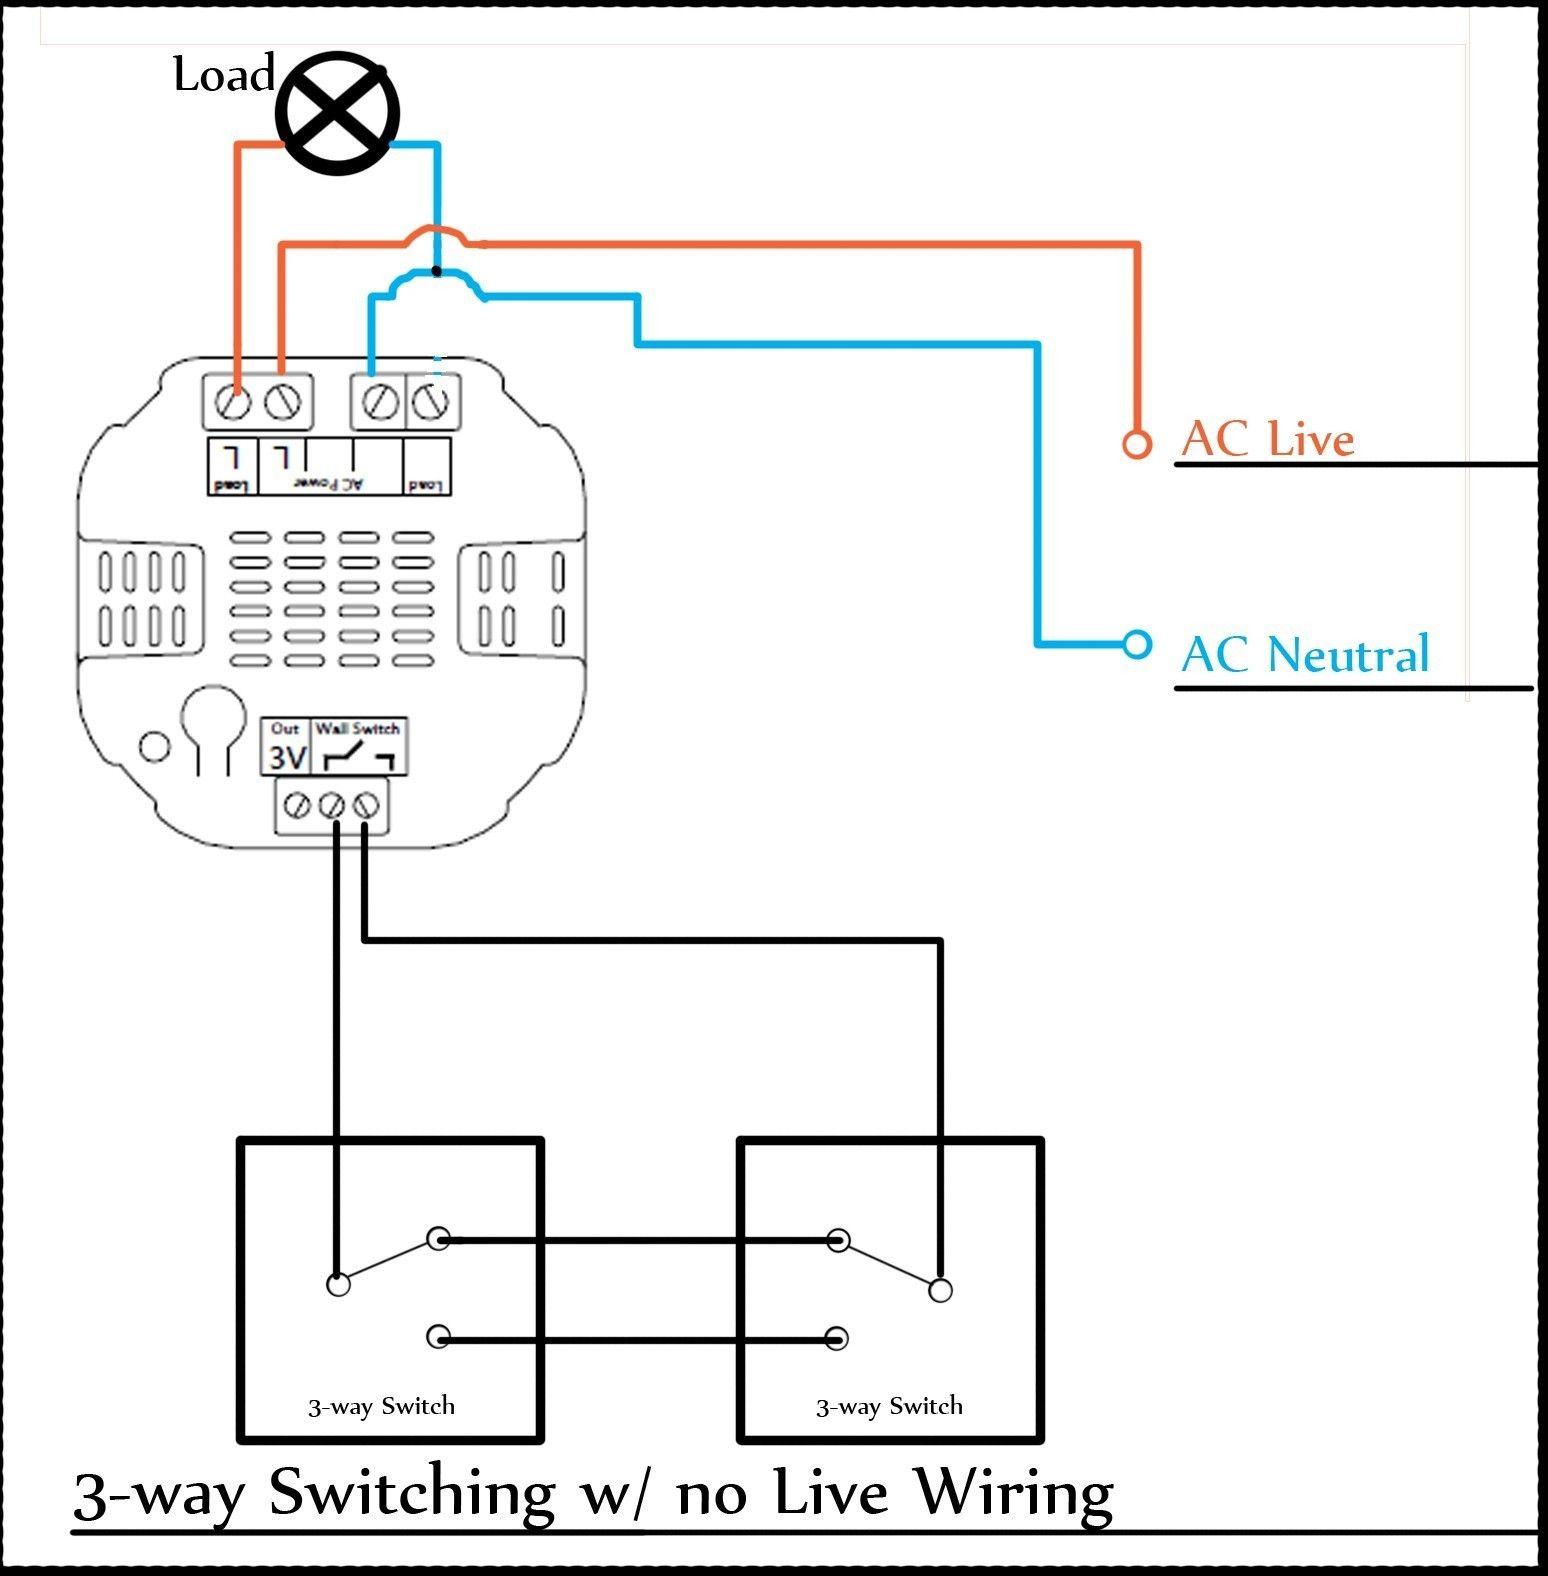 Leviton Decora 3 Way Switch Wiring Diagram 5603 In 2020 3 Way Switch Wiring Ethernet Wiring Diagram